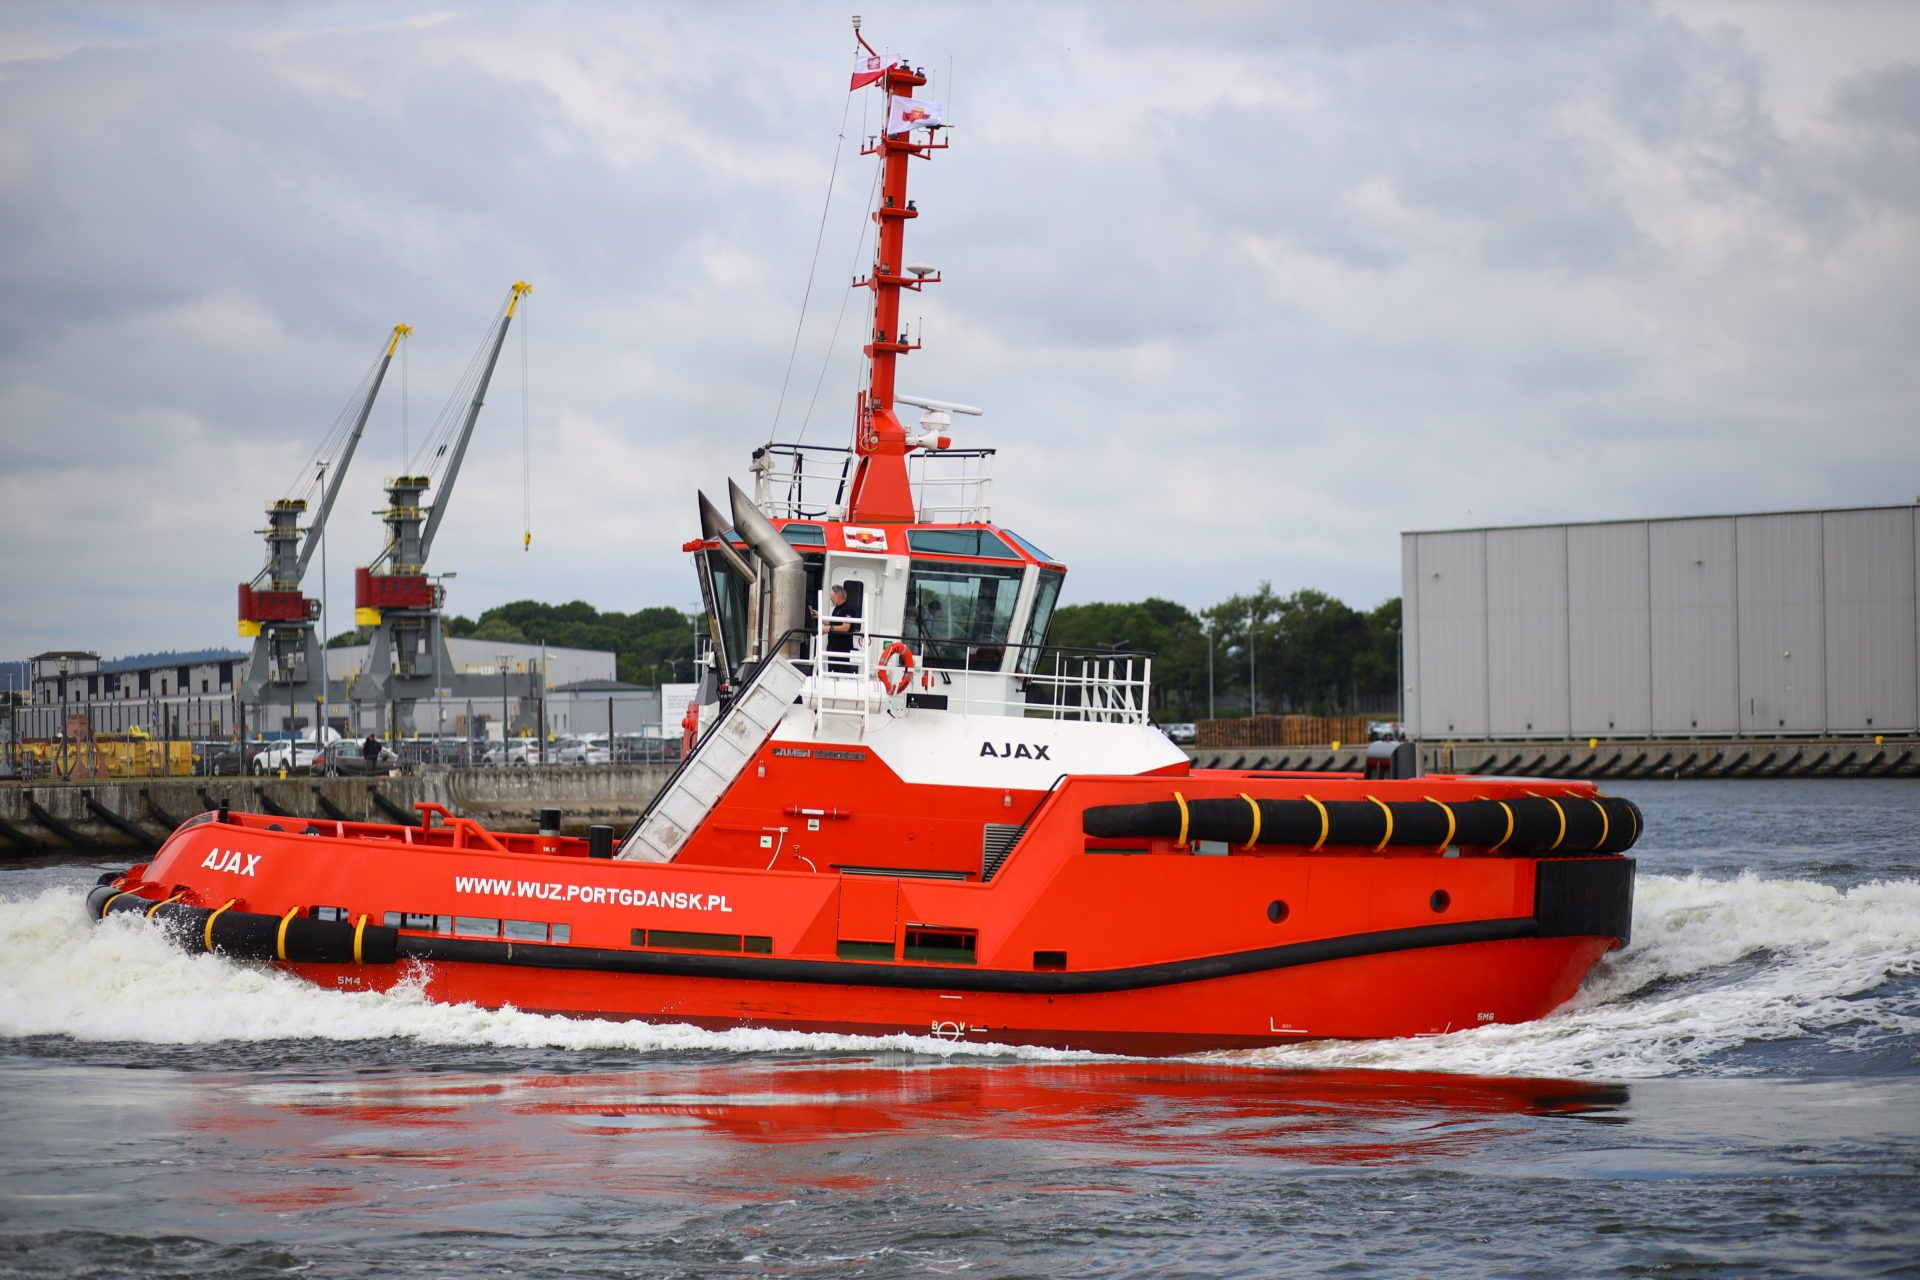 Statek Ajax